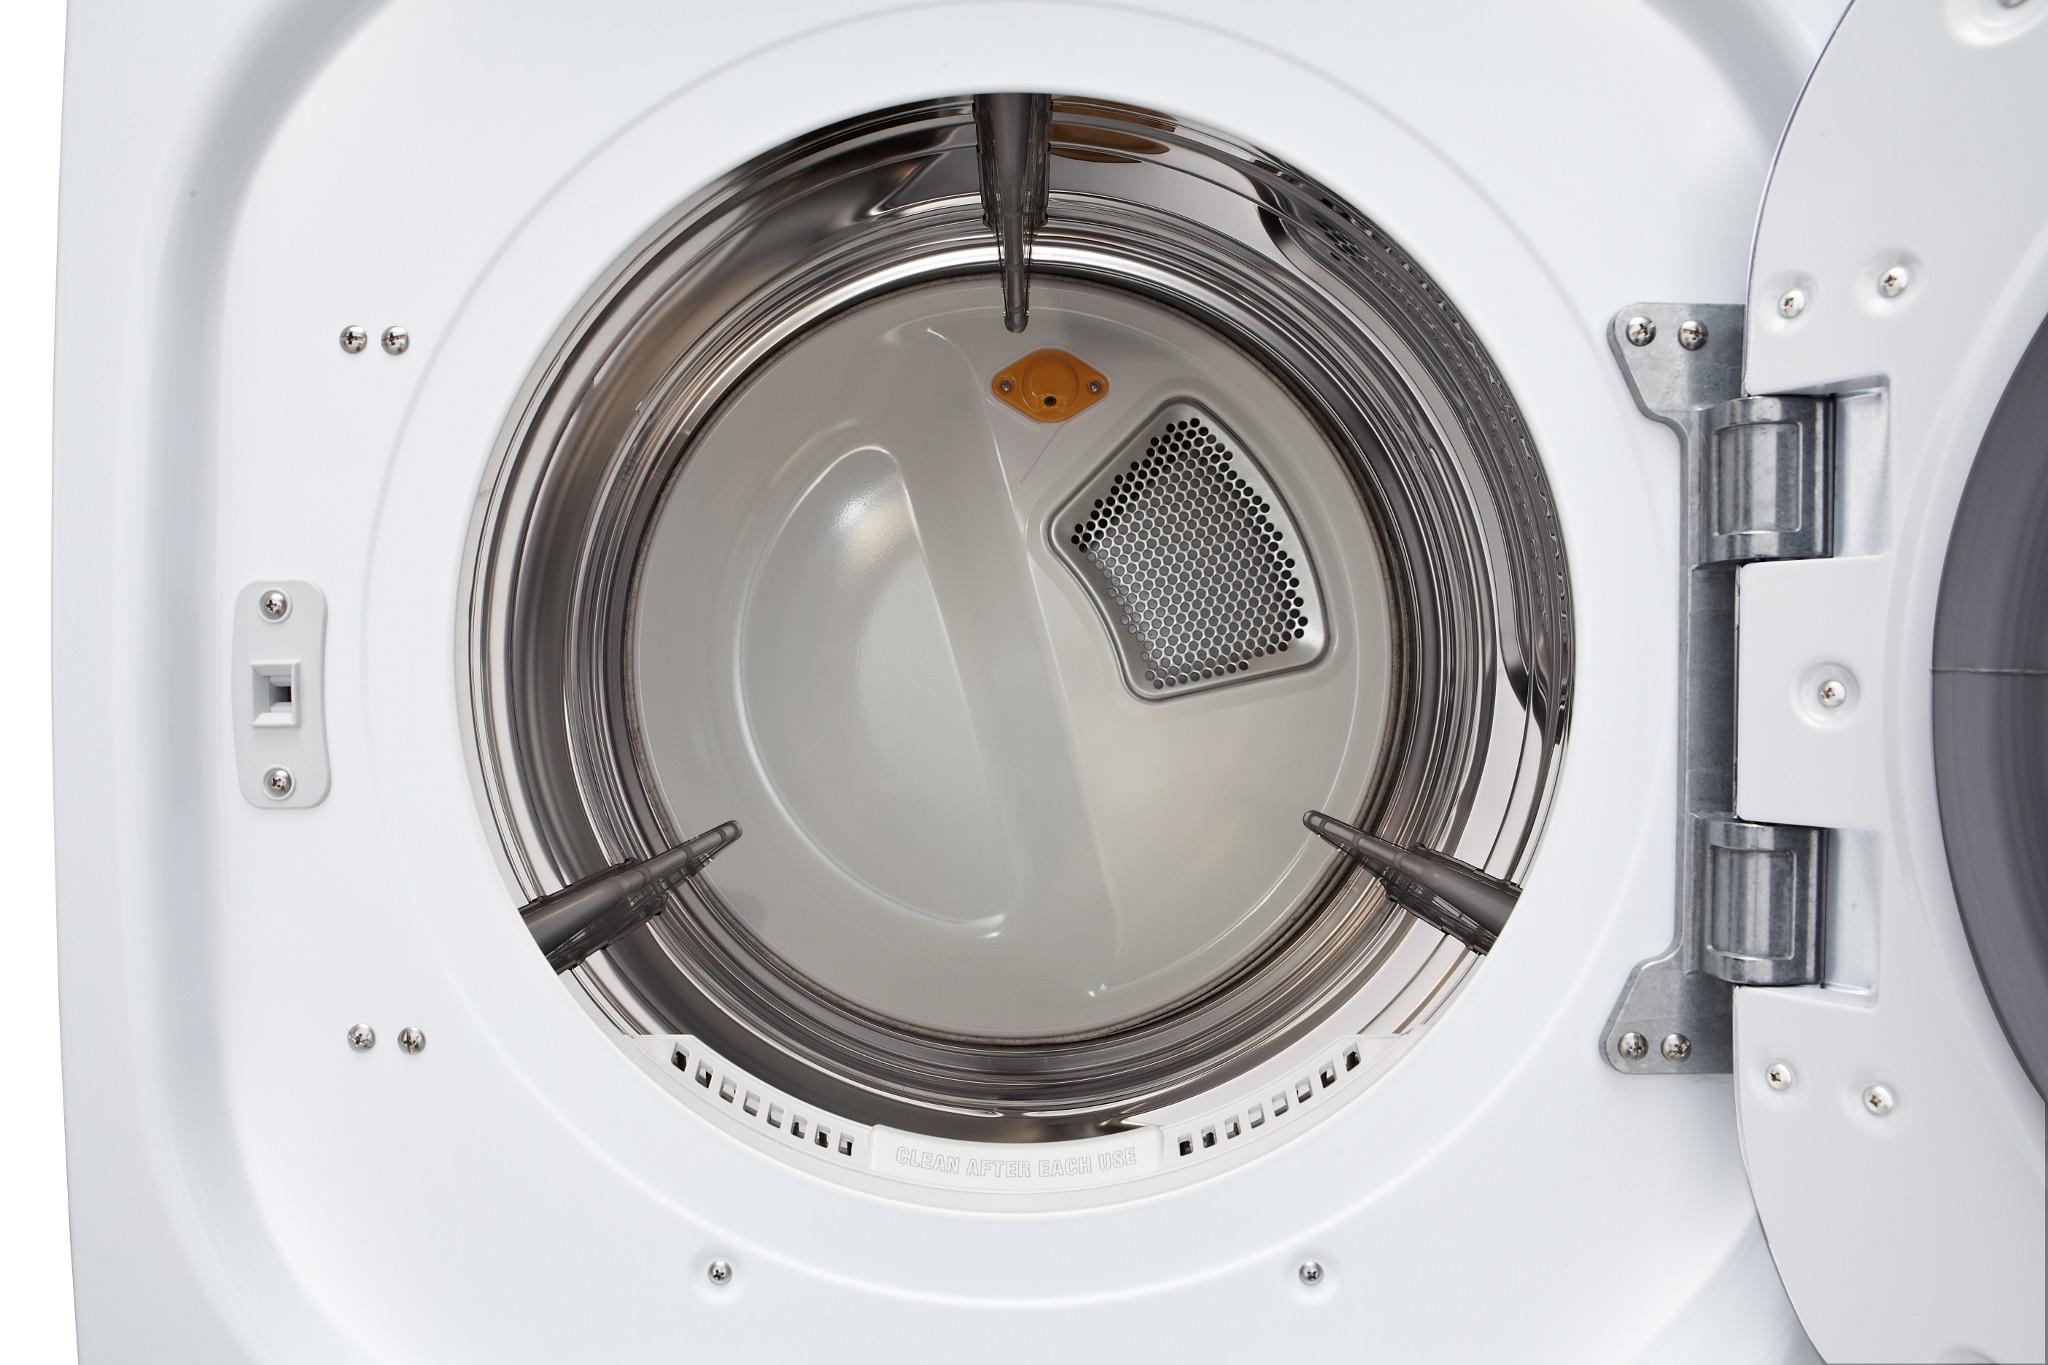 Gas Dryer Venting Options Fumtc Lg Dlex9000v Mega Capacity Smart Appliancejunkcom Whirlpool Diagram Window Front Load Dryerwhitedlgx4371w Dryerdlgx4371 Stewarts Tv Appliance